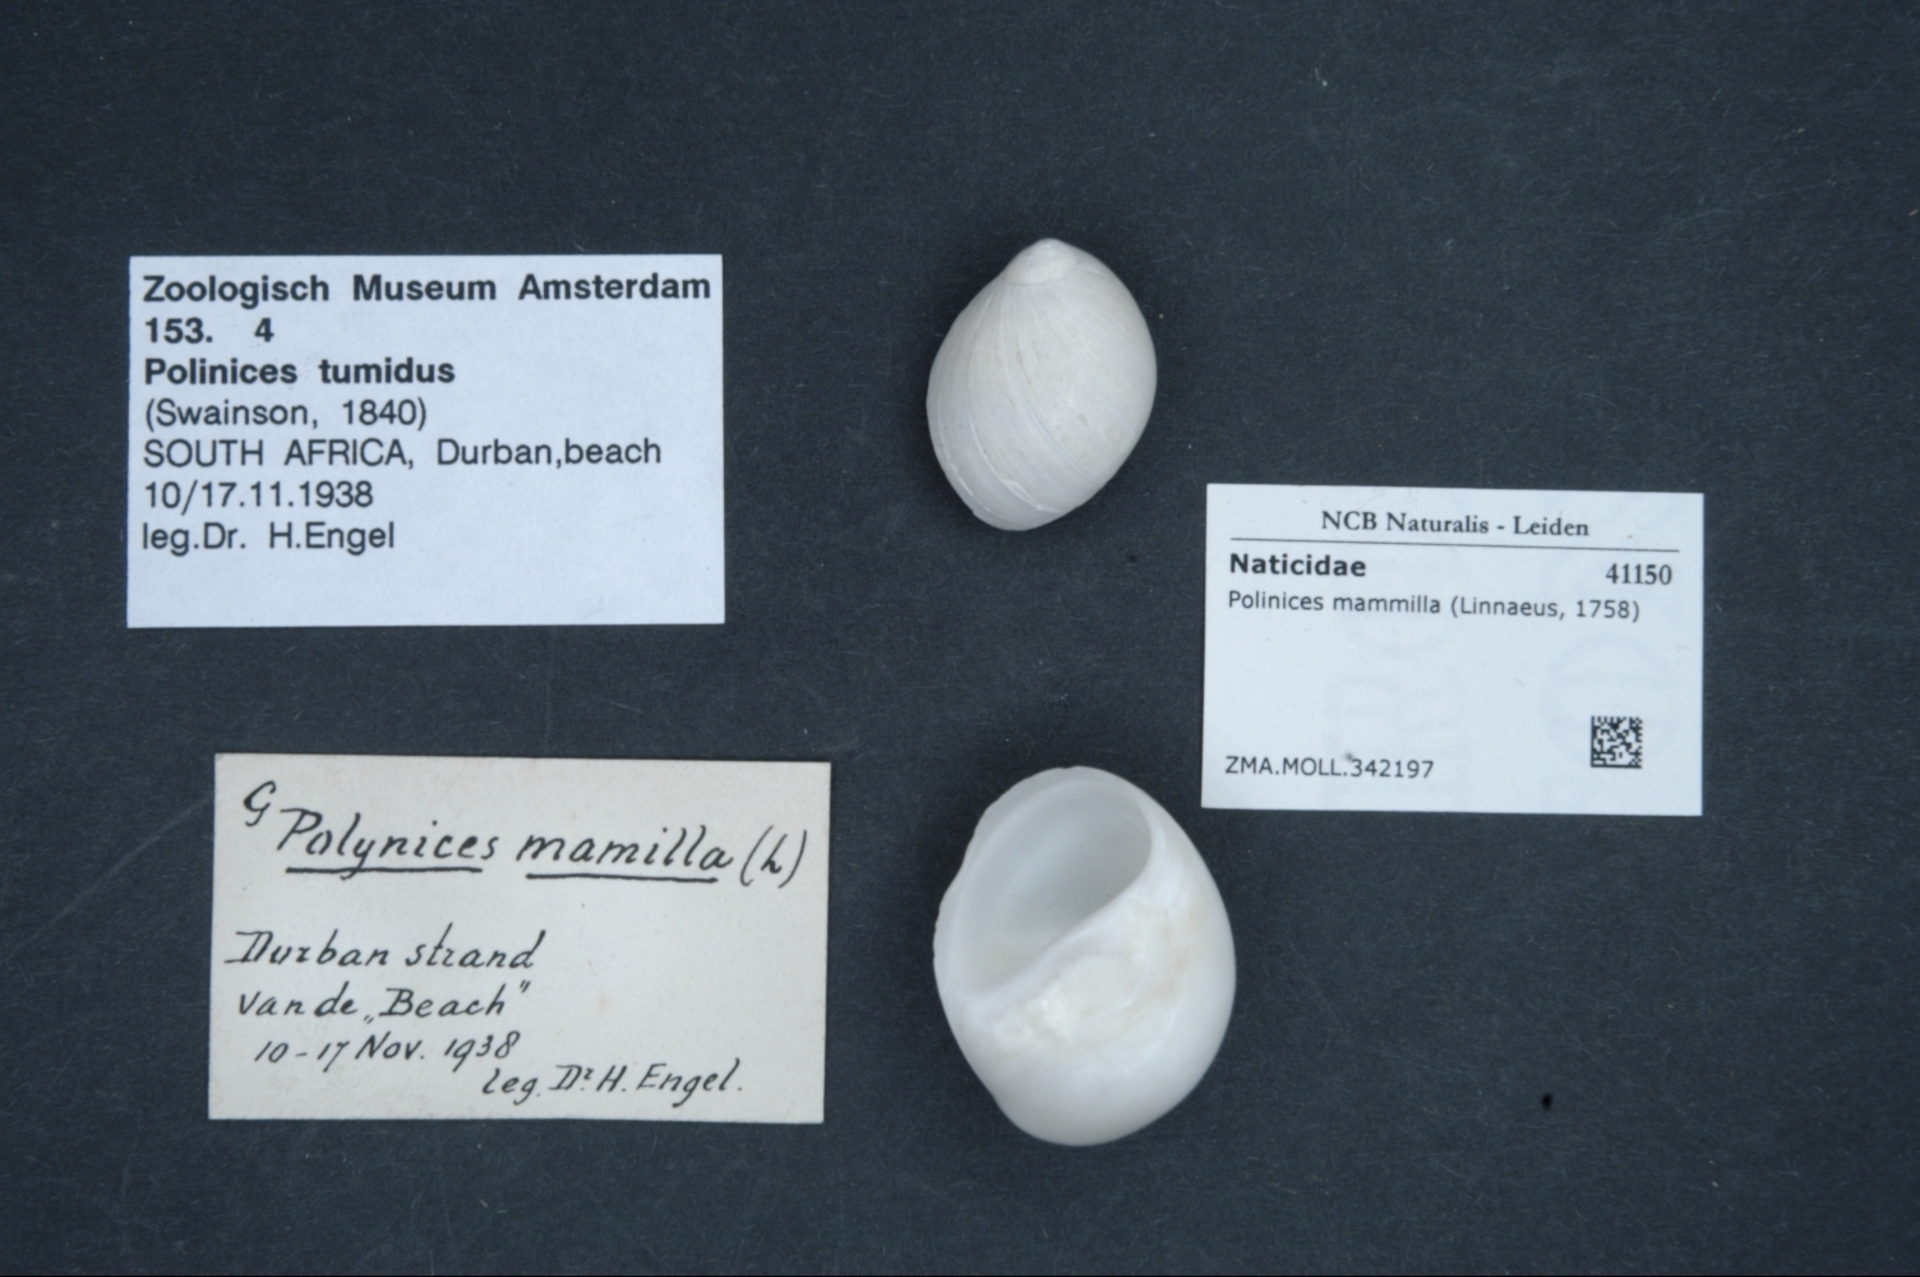 ZMA.MOLL.342197 | Polinices mammilla (Linnaeus, 1758)